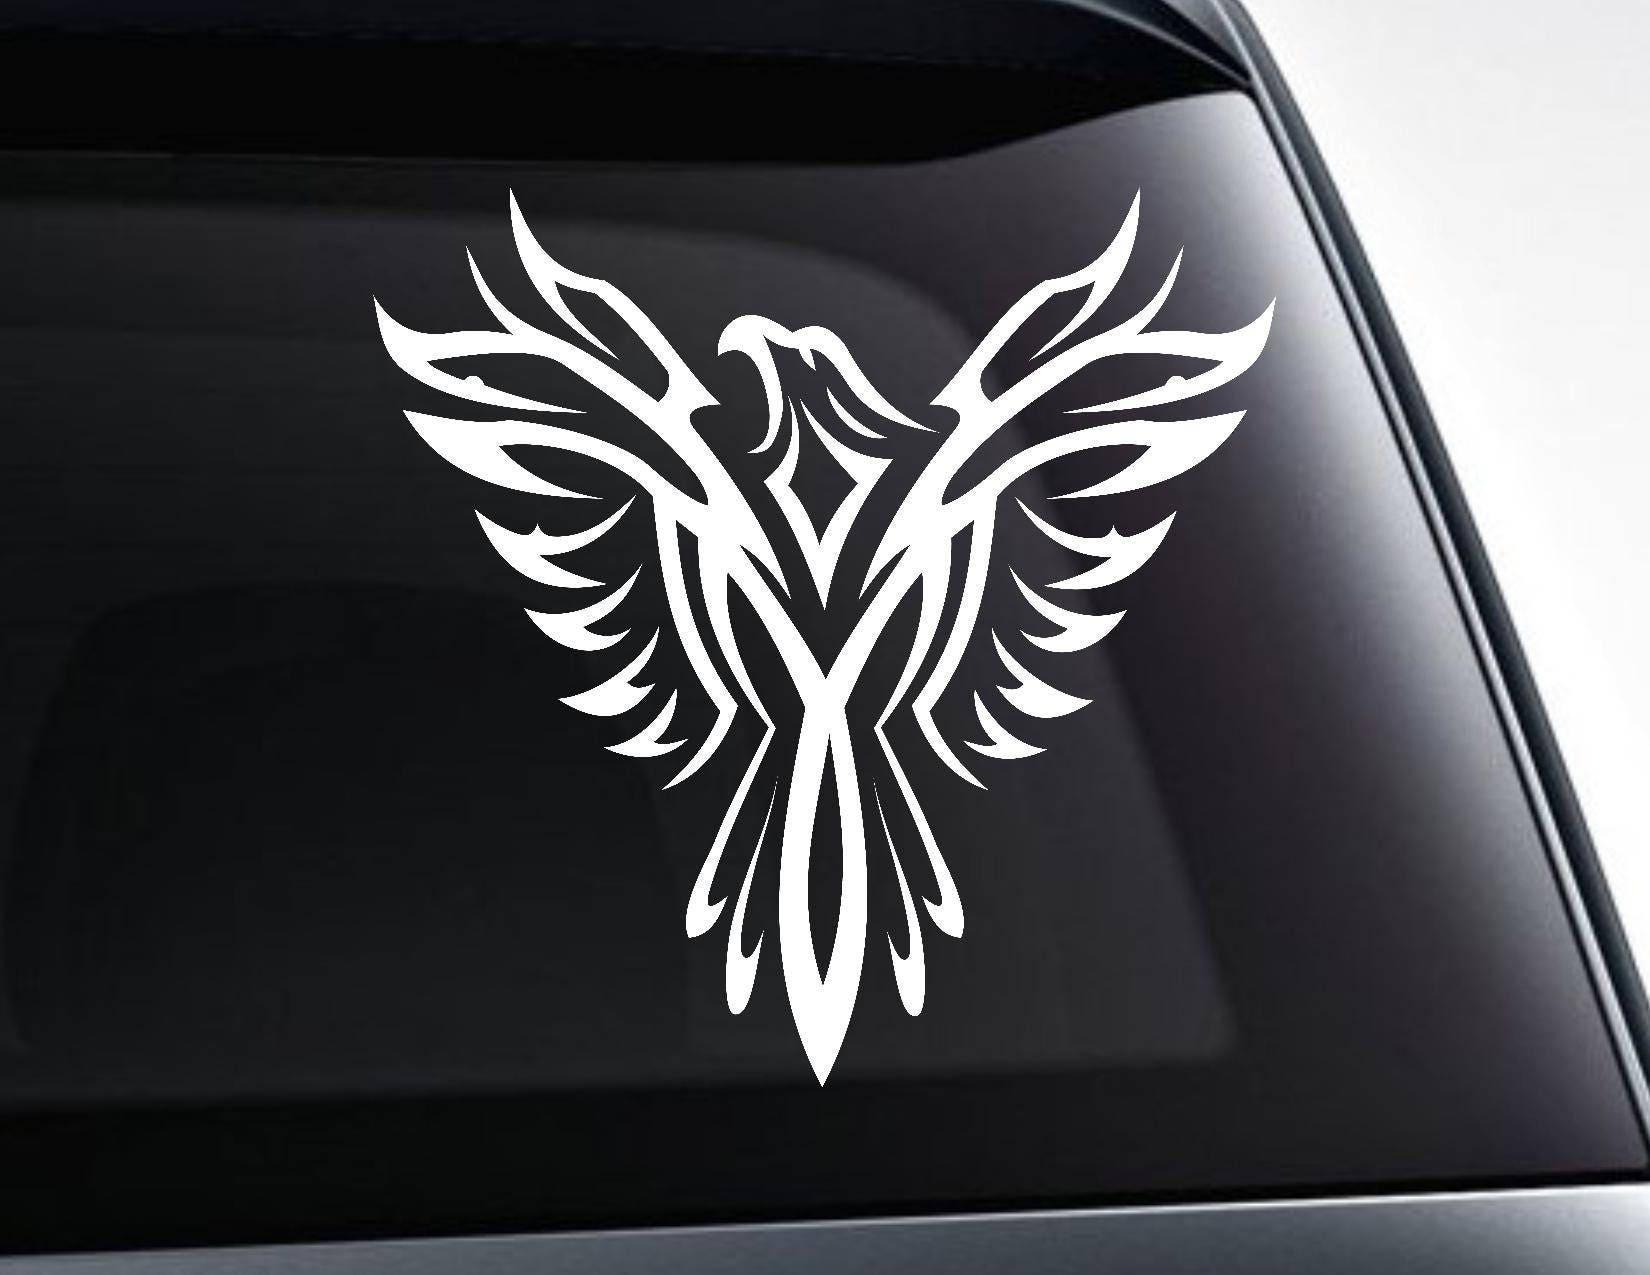 Phoenix Bird Sticker For Car